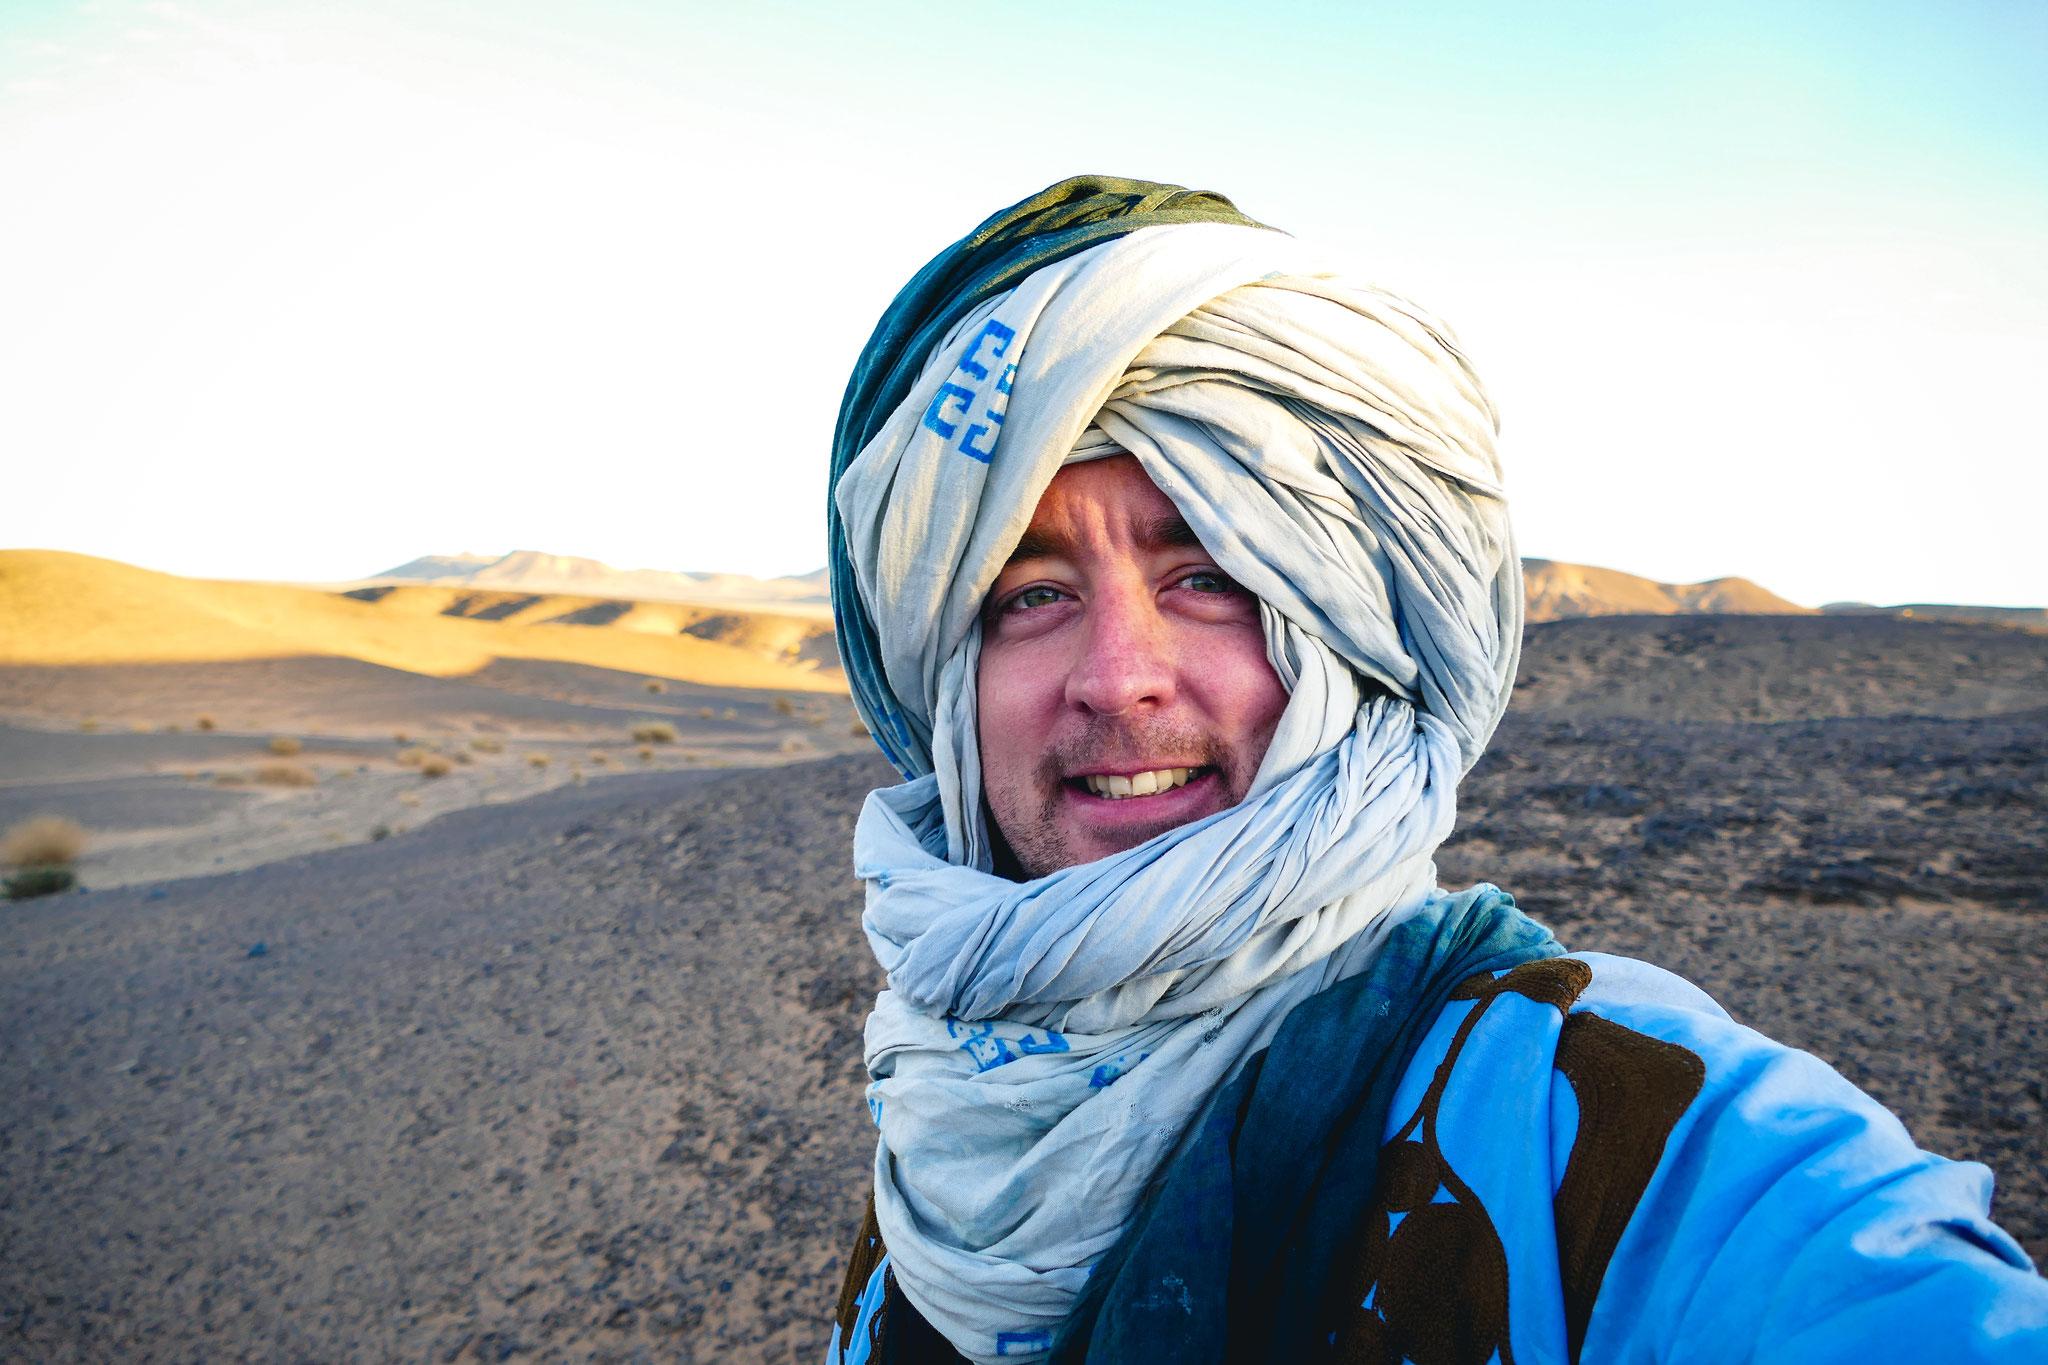 Maroc désert nomade